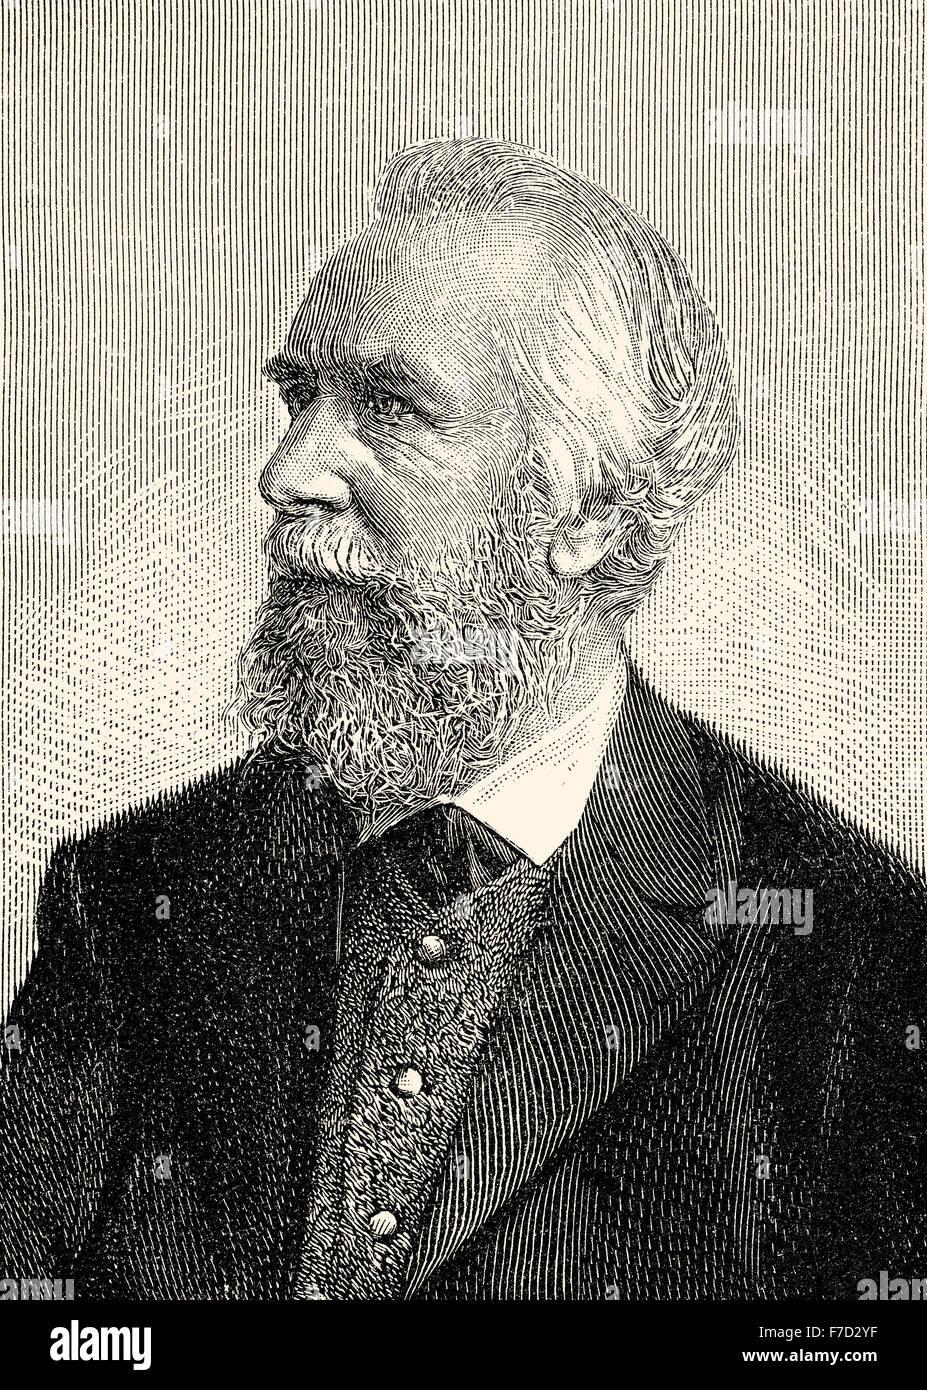 Ernst Heinrich Philipp August Haeckel,1834-1919, a German biologist, naturalist, philosopher, physician, professor, Stock Photo